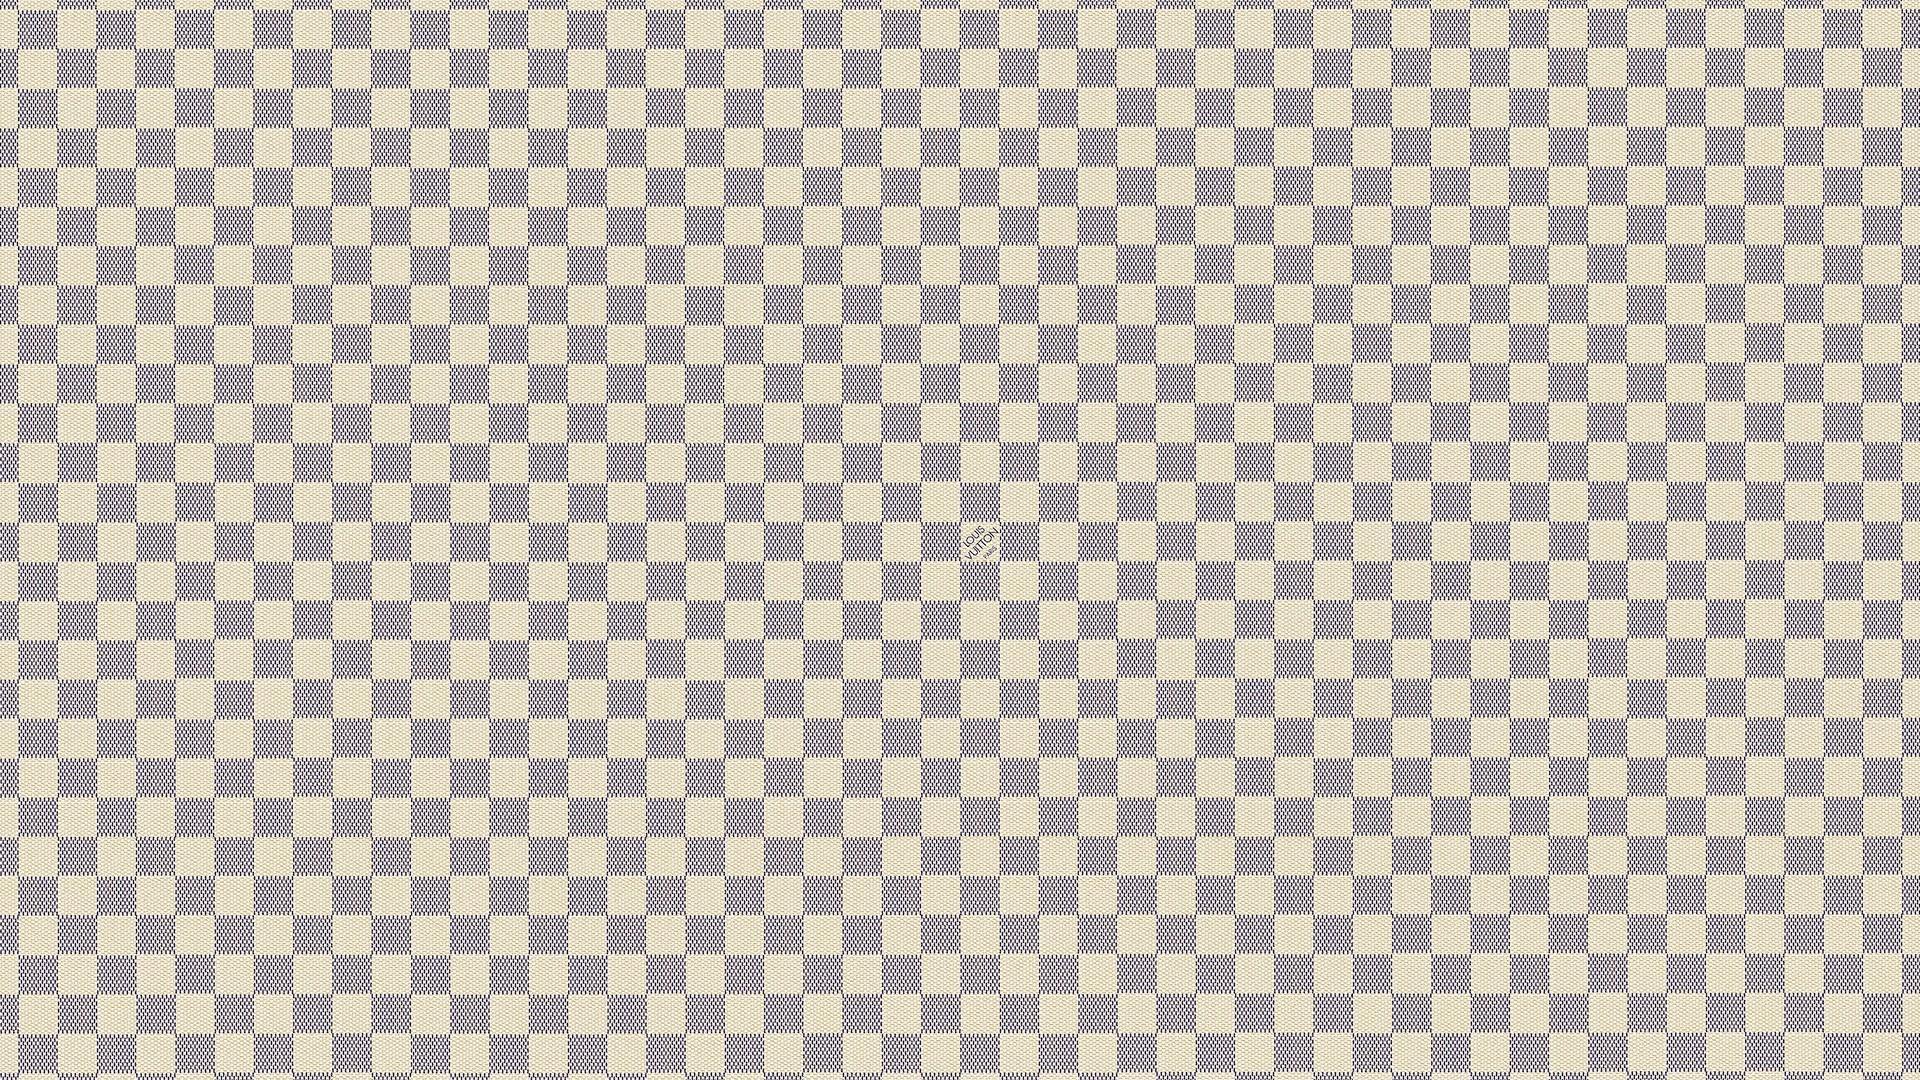 Pink Louis Vuitton Wallpaper - Unicorn Lol Surprise Png , HD Wallpaper & Backgrounds